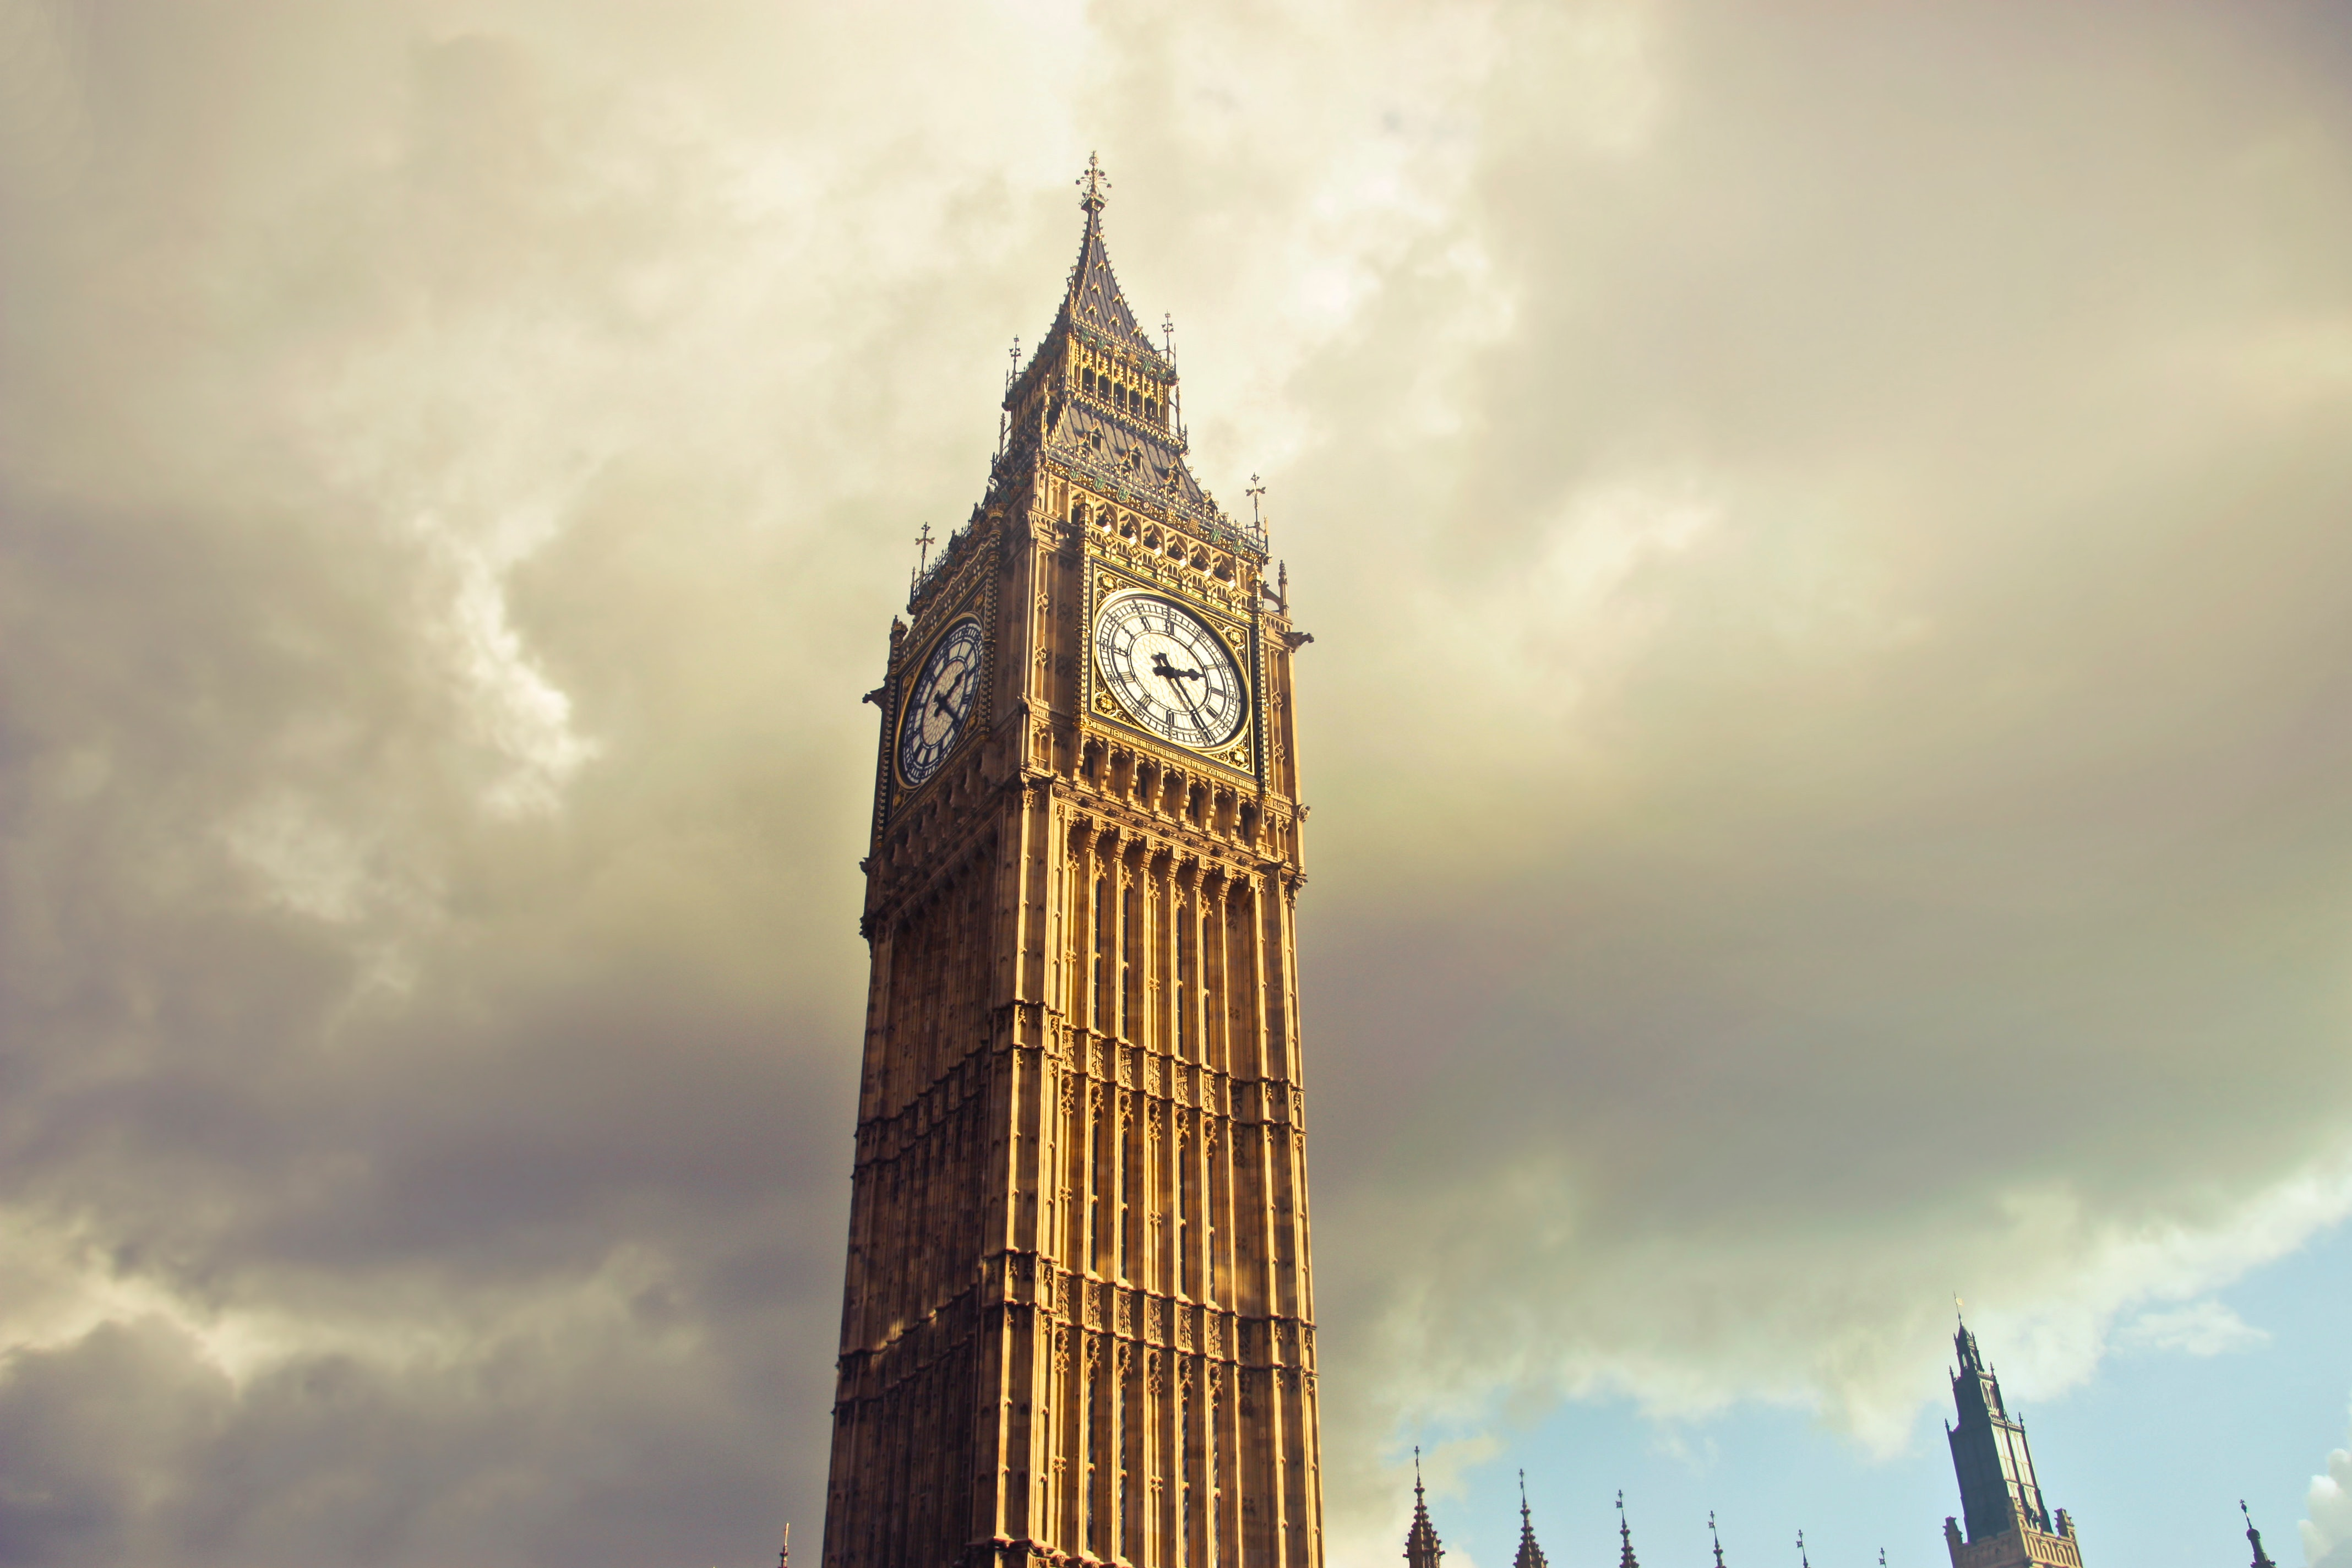 Queen elizabeth tower, london photo